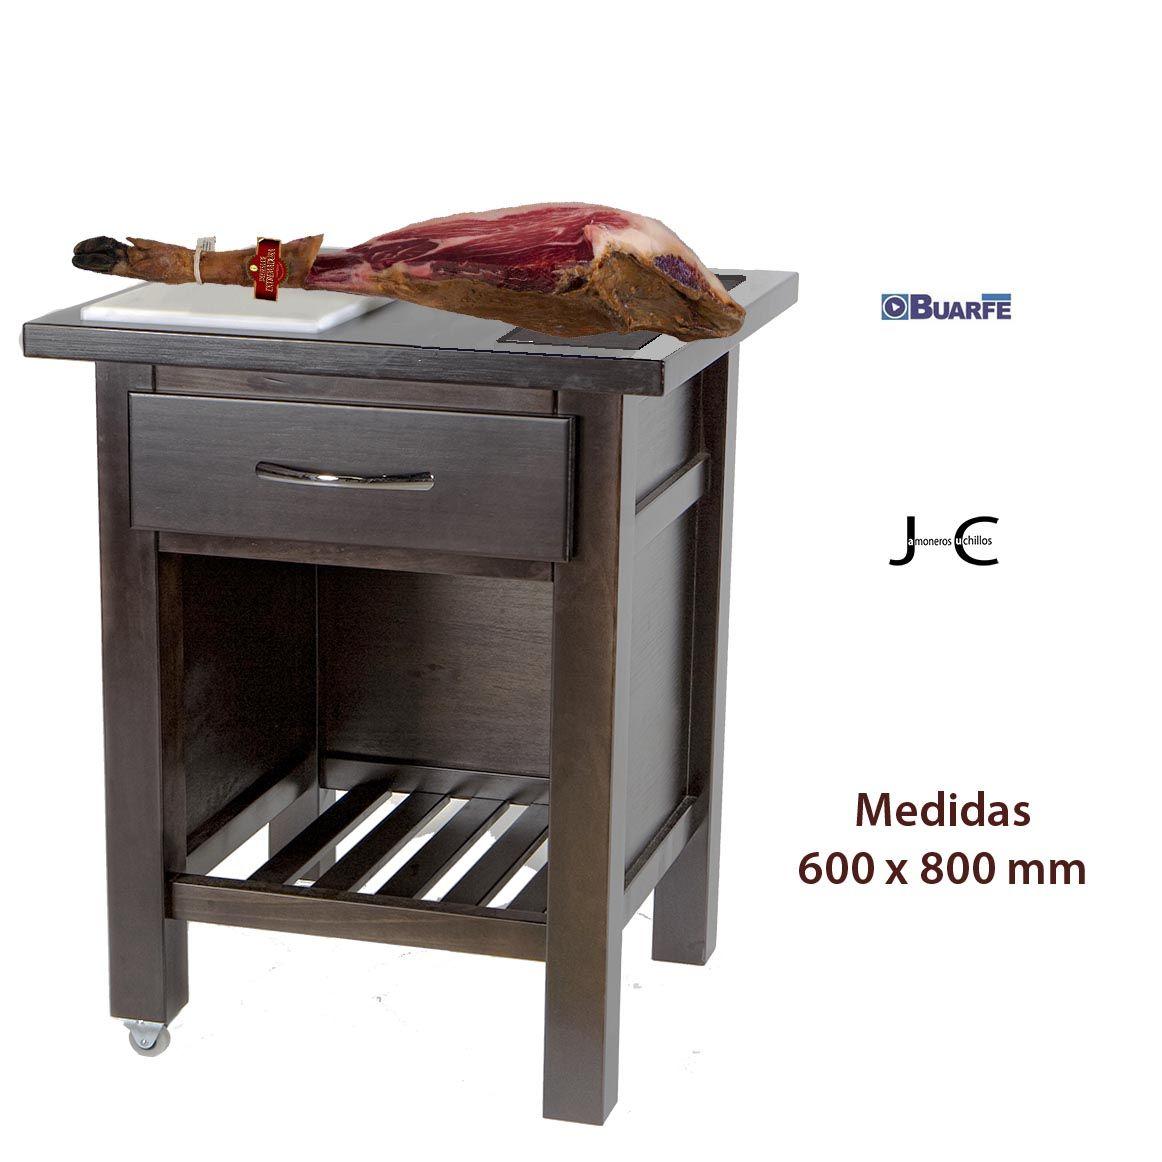 Mesa jamonera profesional de 800x600 cm buarfe